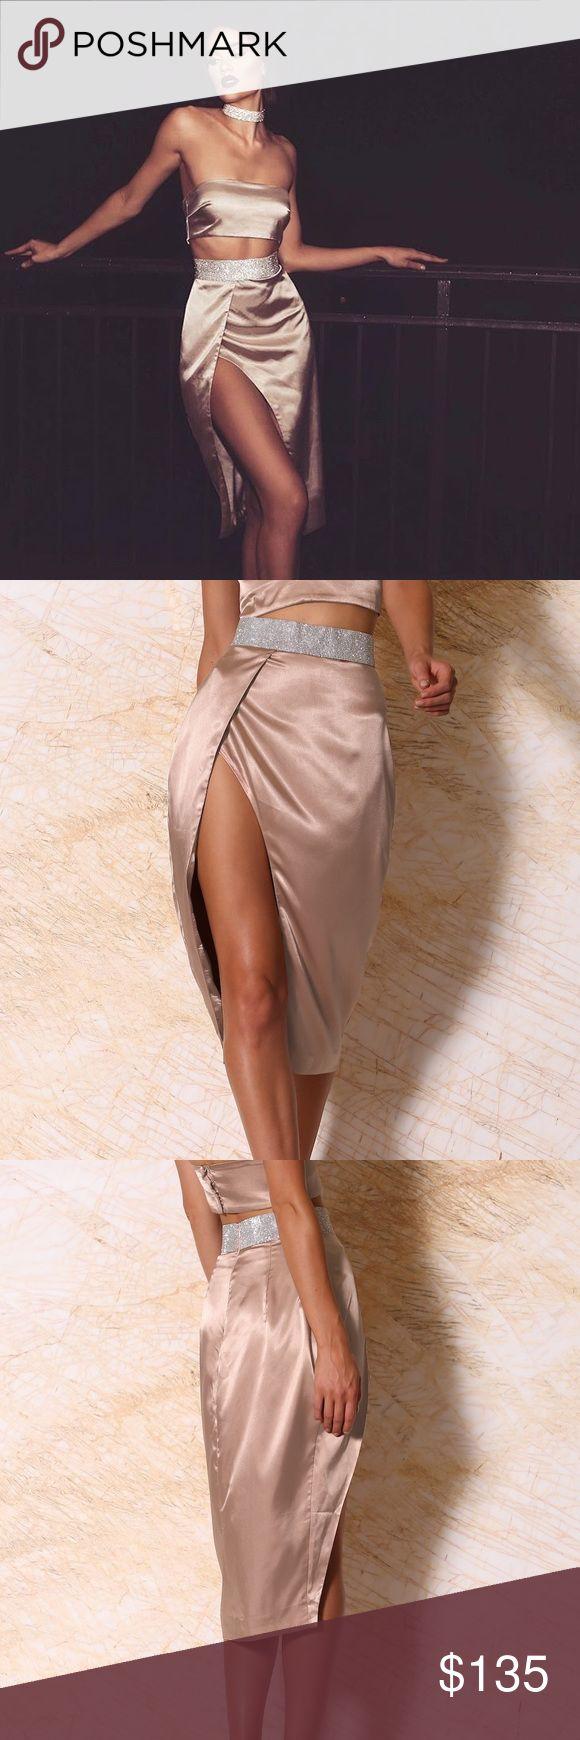 MESHKI Boutique Wrap Skirt and Bandeau- Blush MESHKI Boutique Candice Satin Diamond Midi Wrap Skirt and Izumi Satin Panel Bandeau- Blush, Two- Piece set MESHKI Boutique Dresses Midi